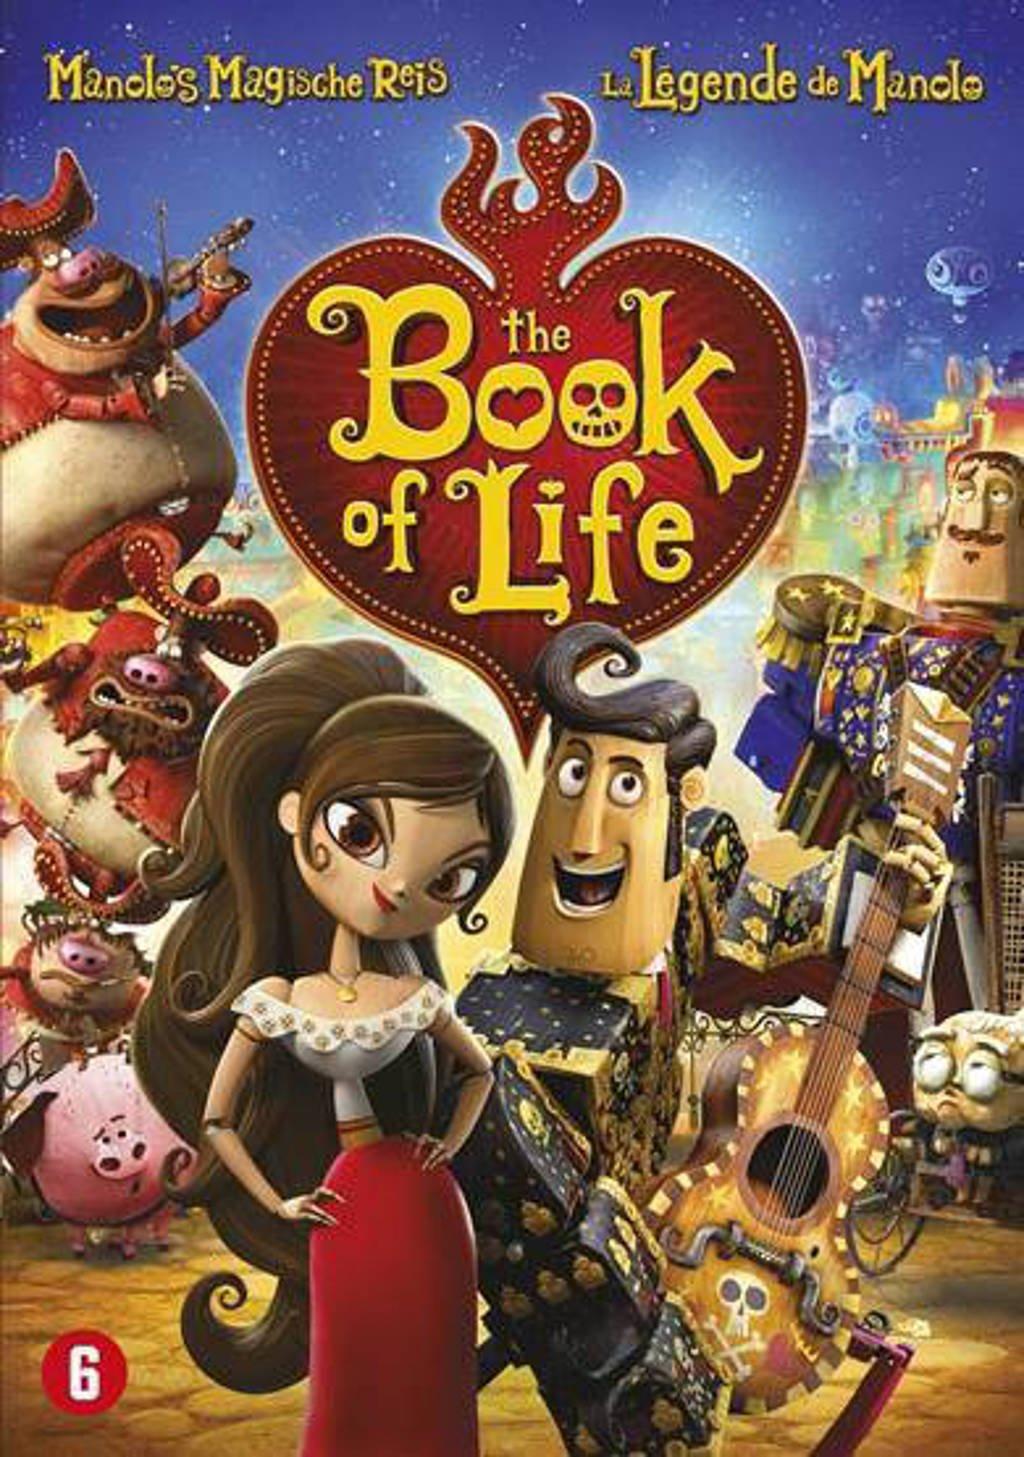 Book of life (DVD)